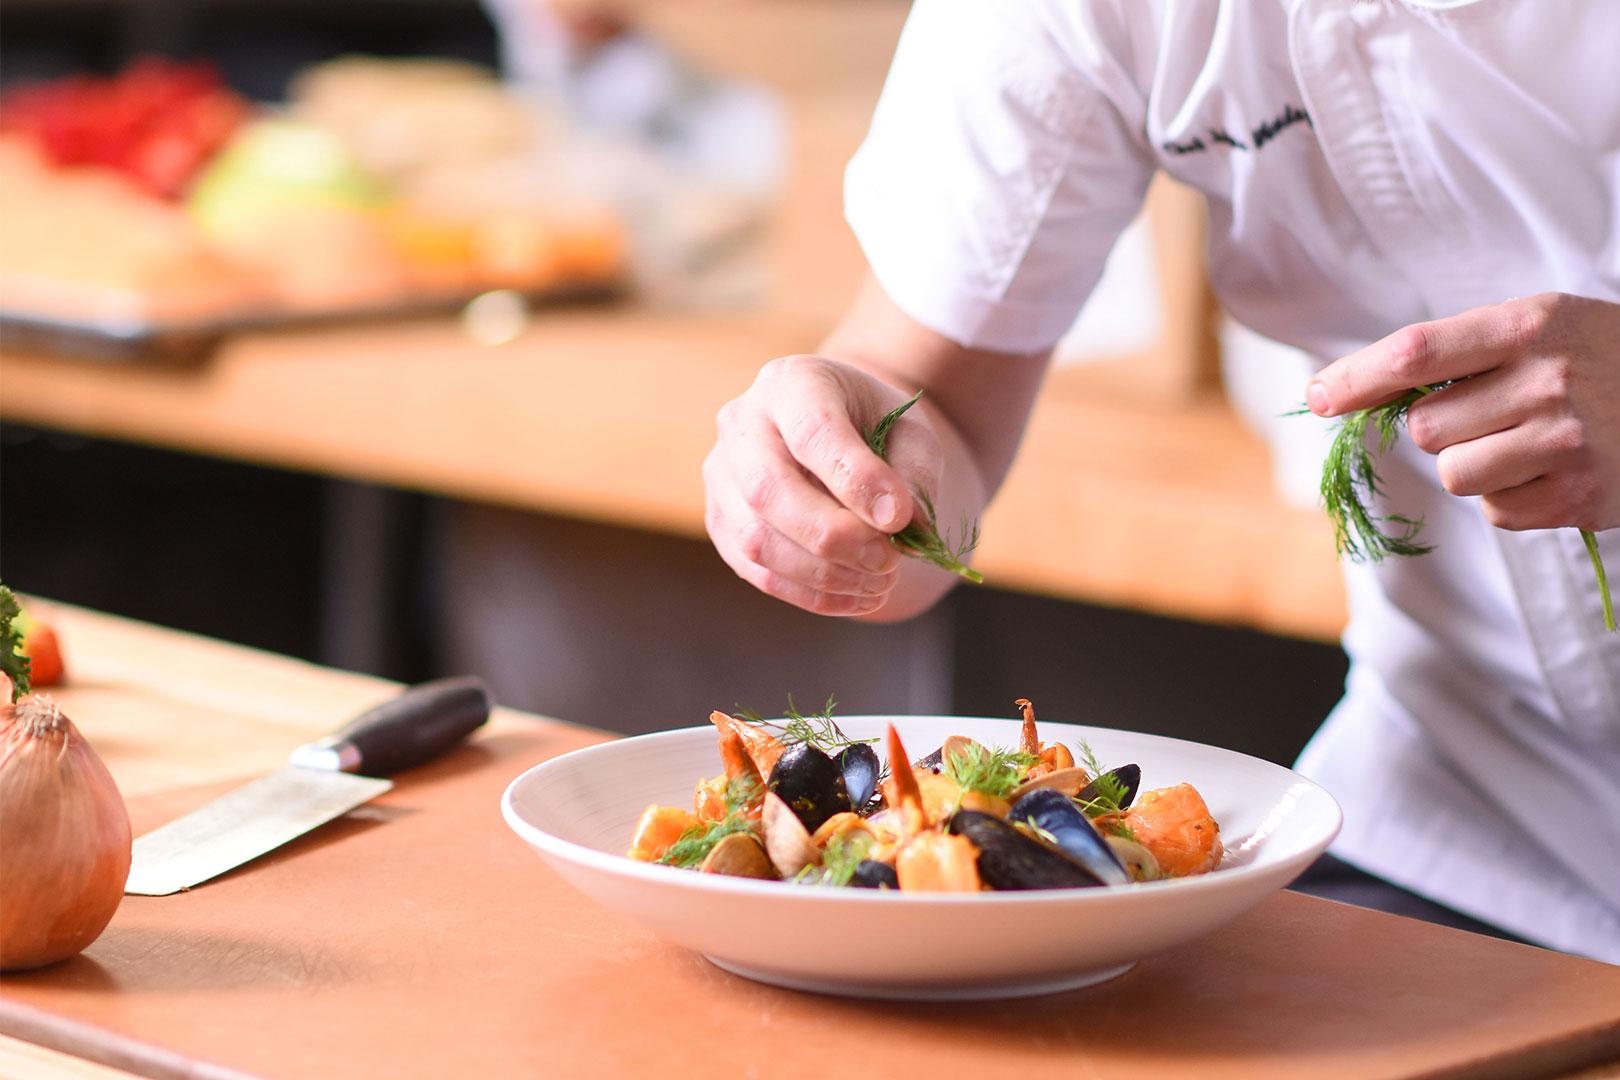 18206-tcr-marisol-chef-with-paella-garnishing